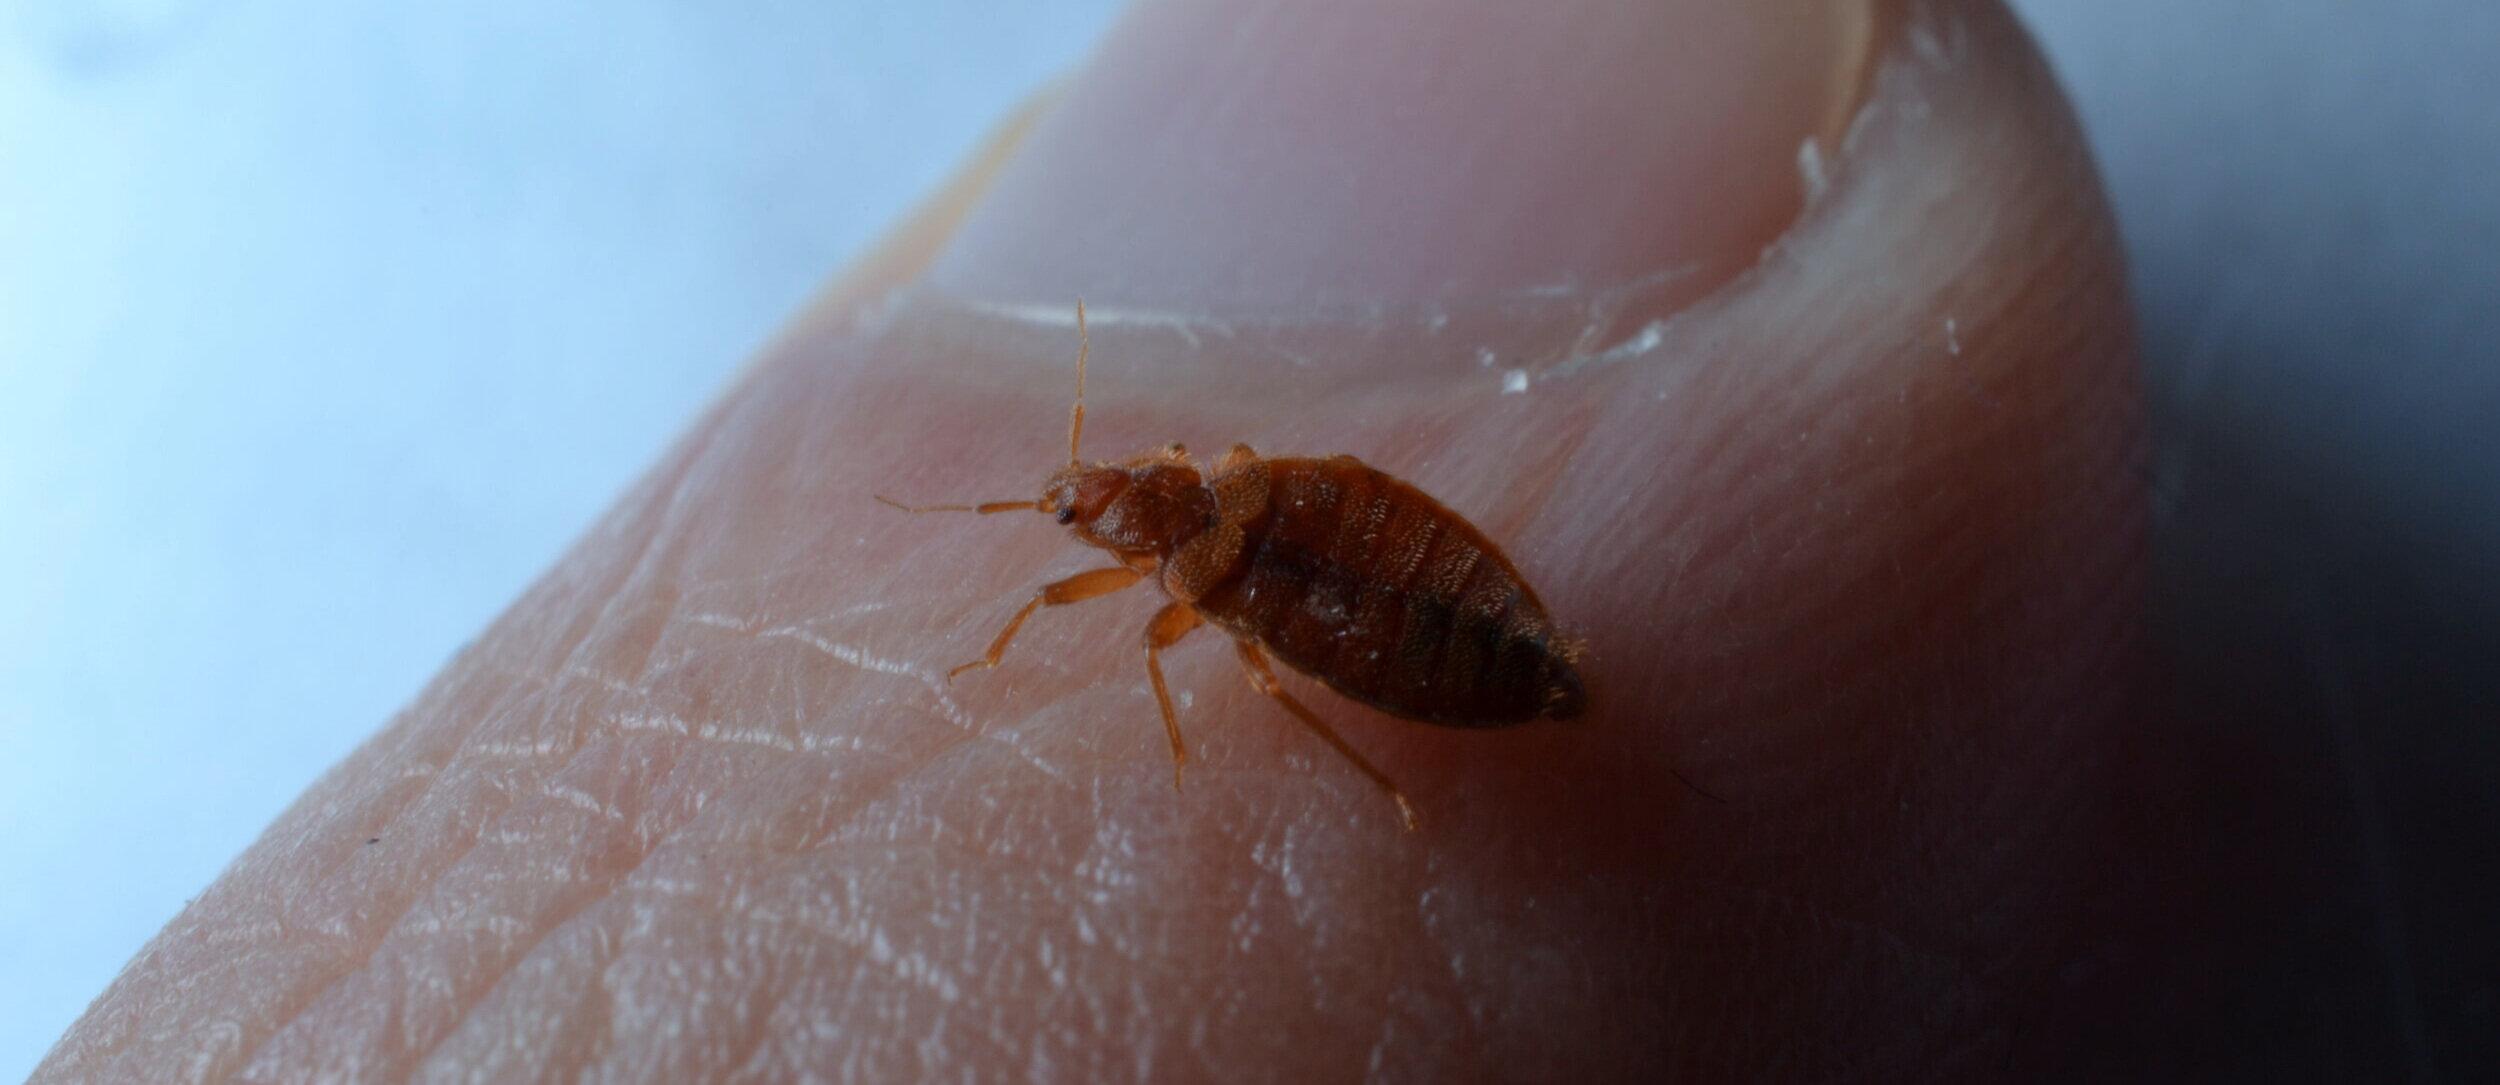 Calgary Bed Bug Exterminator Bed Bug Removal Calgary Pest Control Professional Exterminator Services